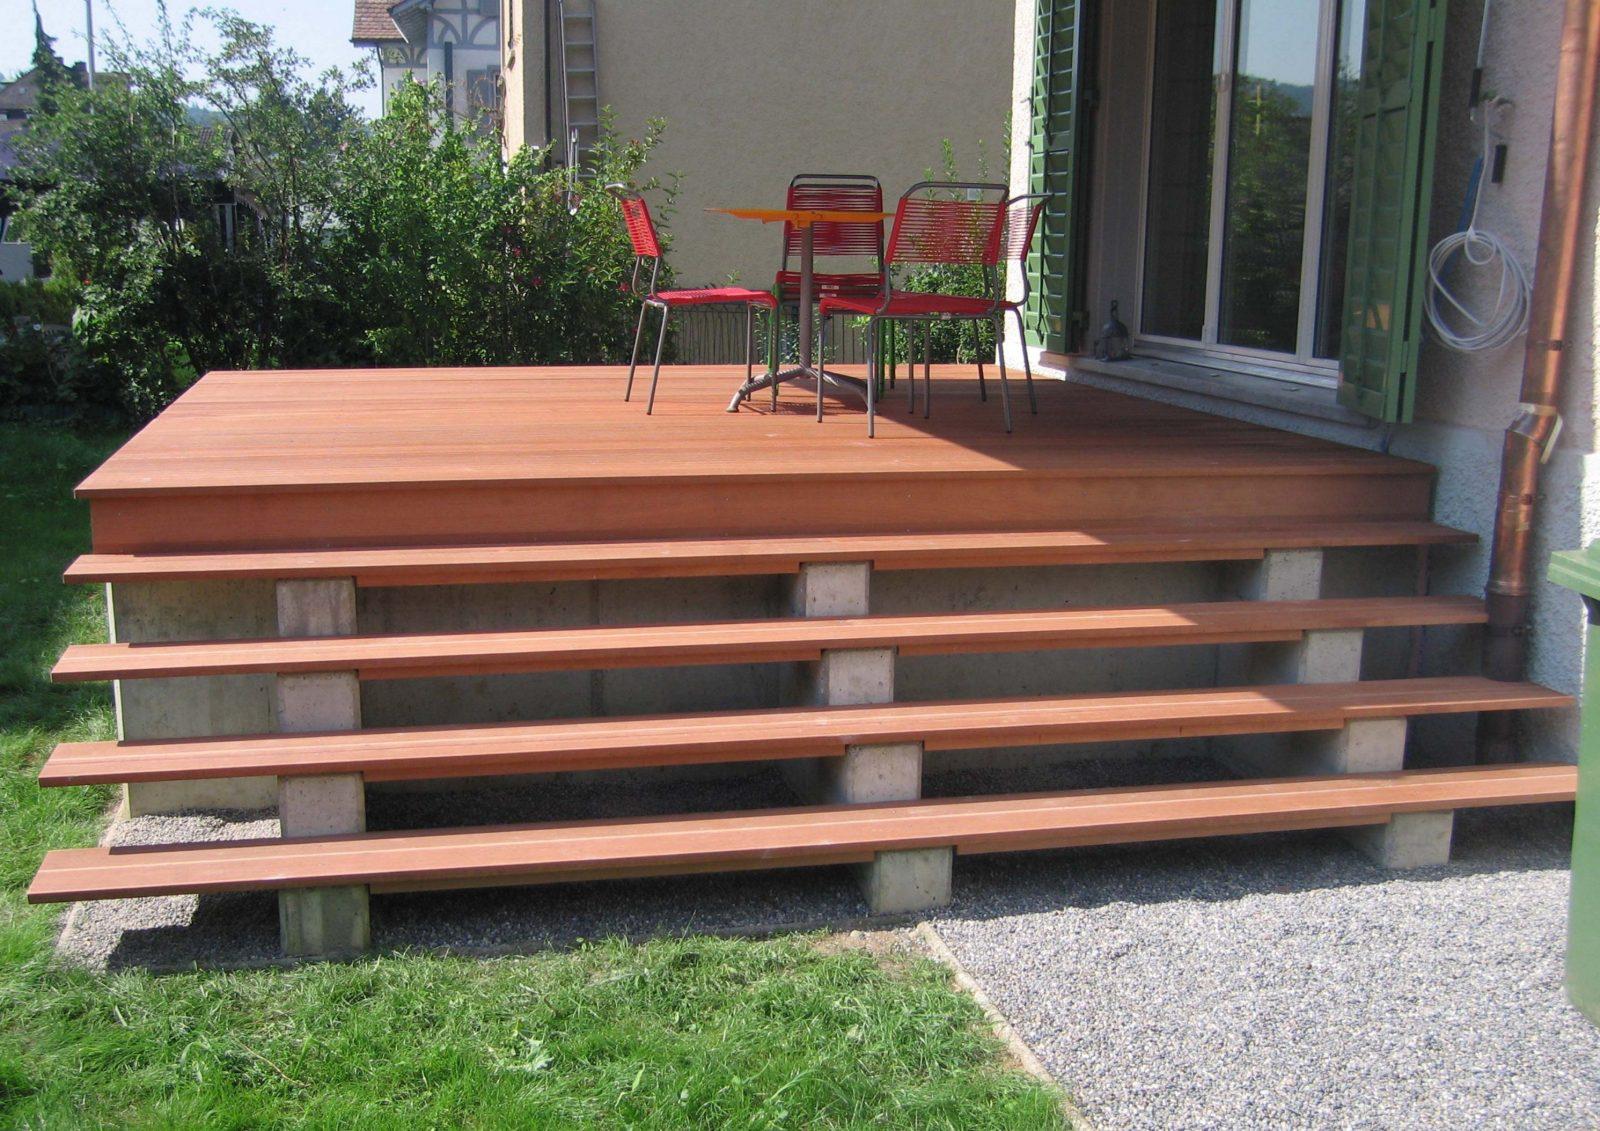 Holz Ausentreppe Selber Bauen Bauanleitung – Patrial Within von Außentreppe Selber Bauen Holz Bild